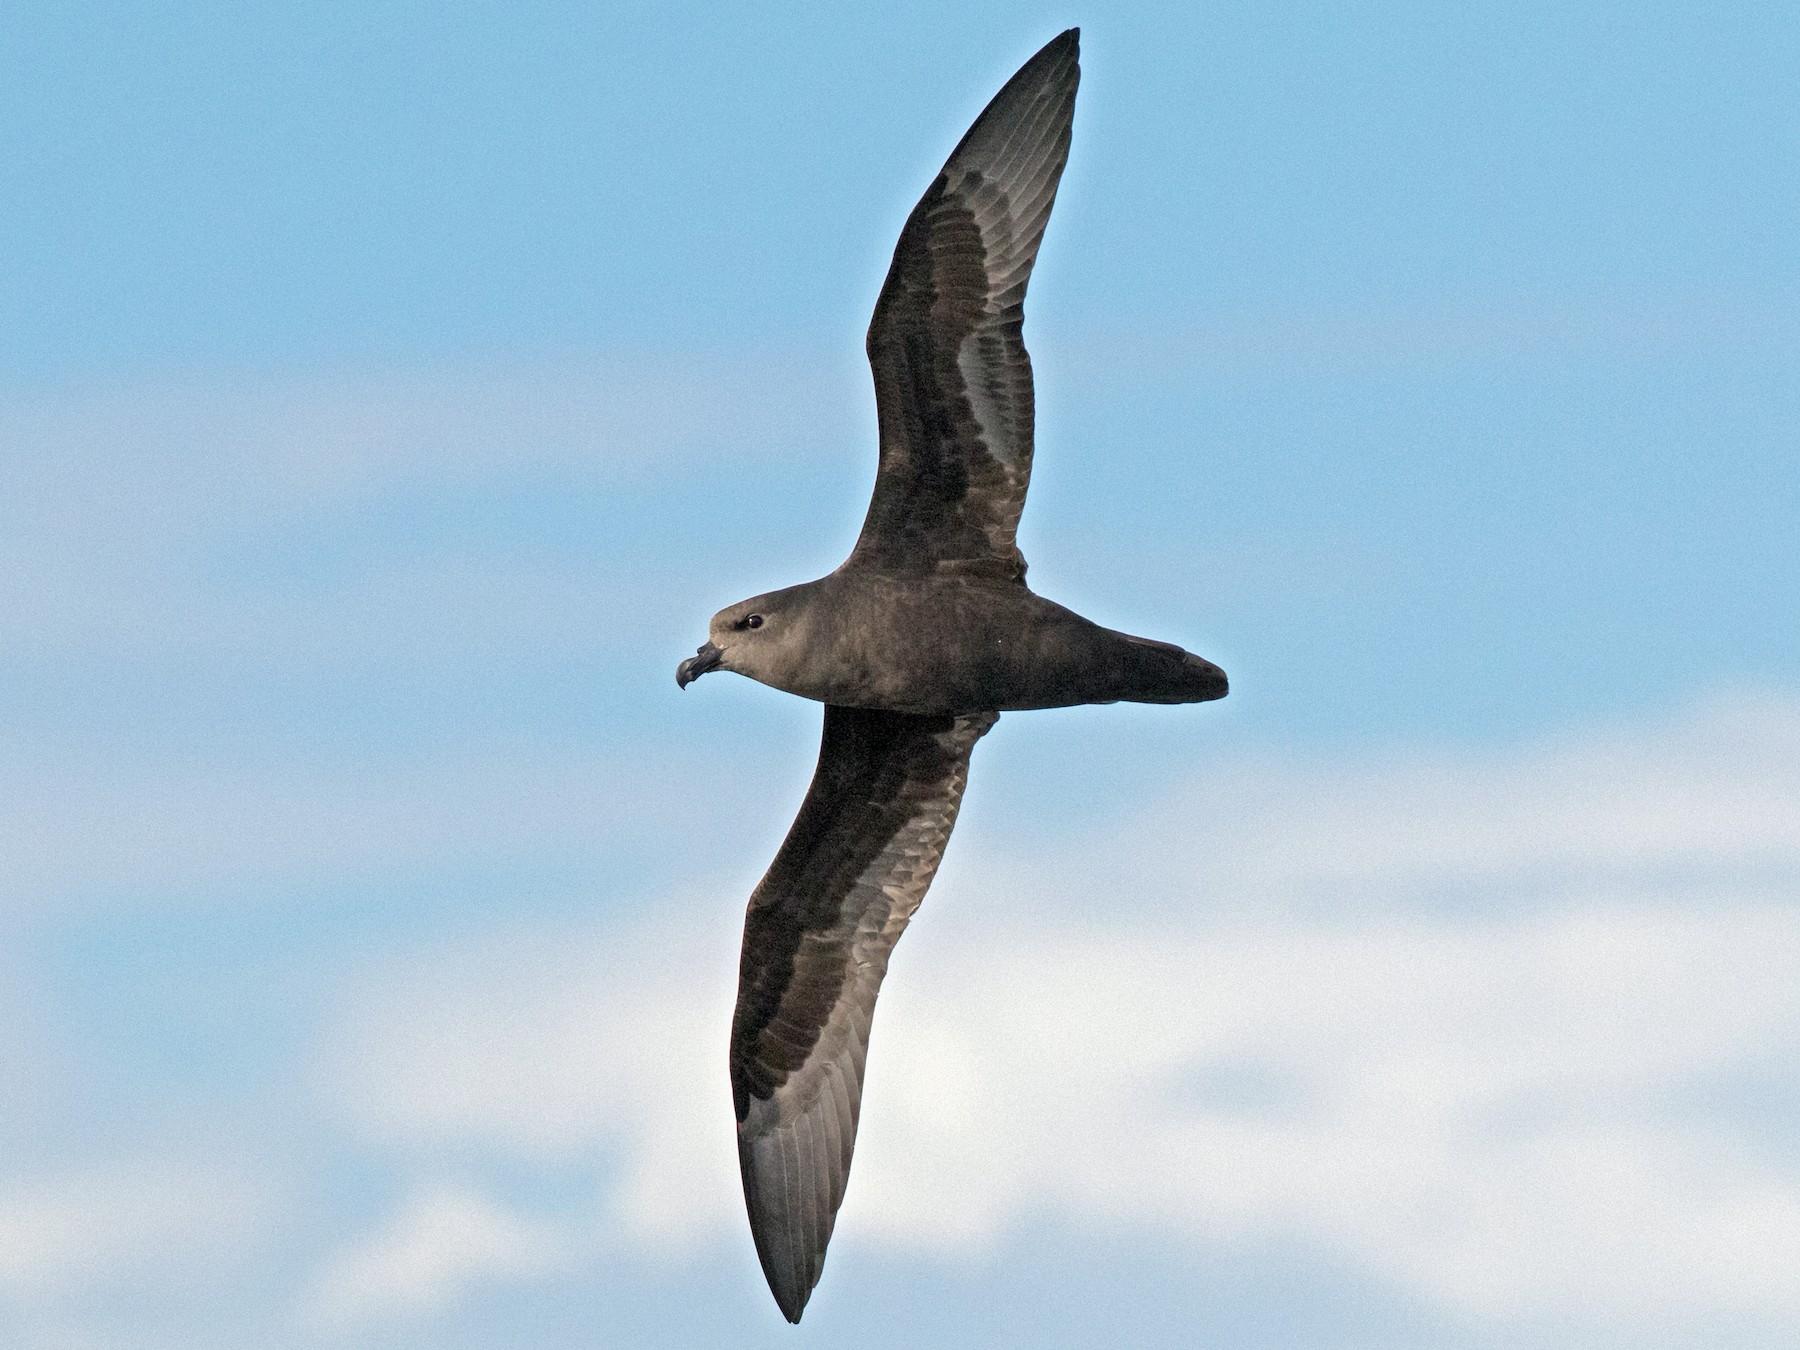 Great-winged Petrel - Damian Kelly